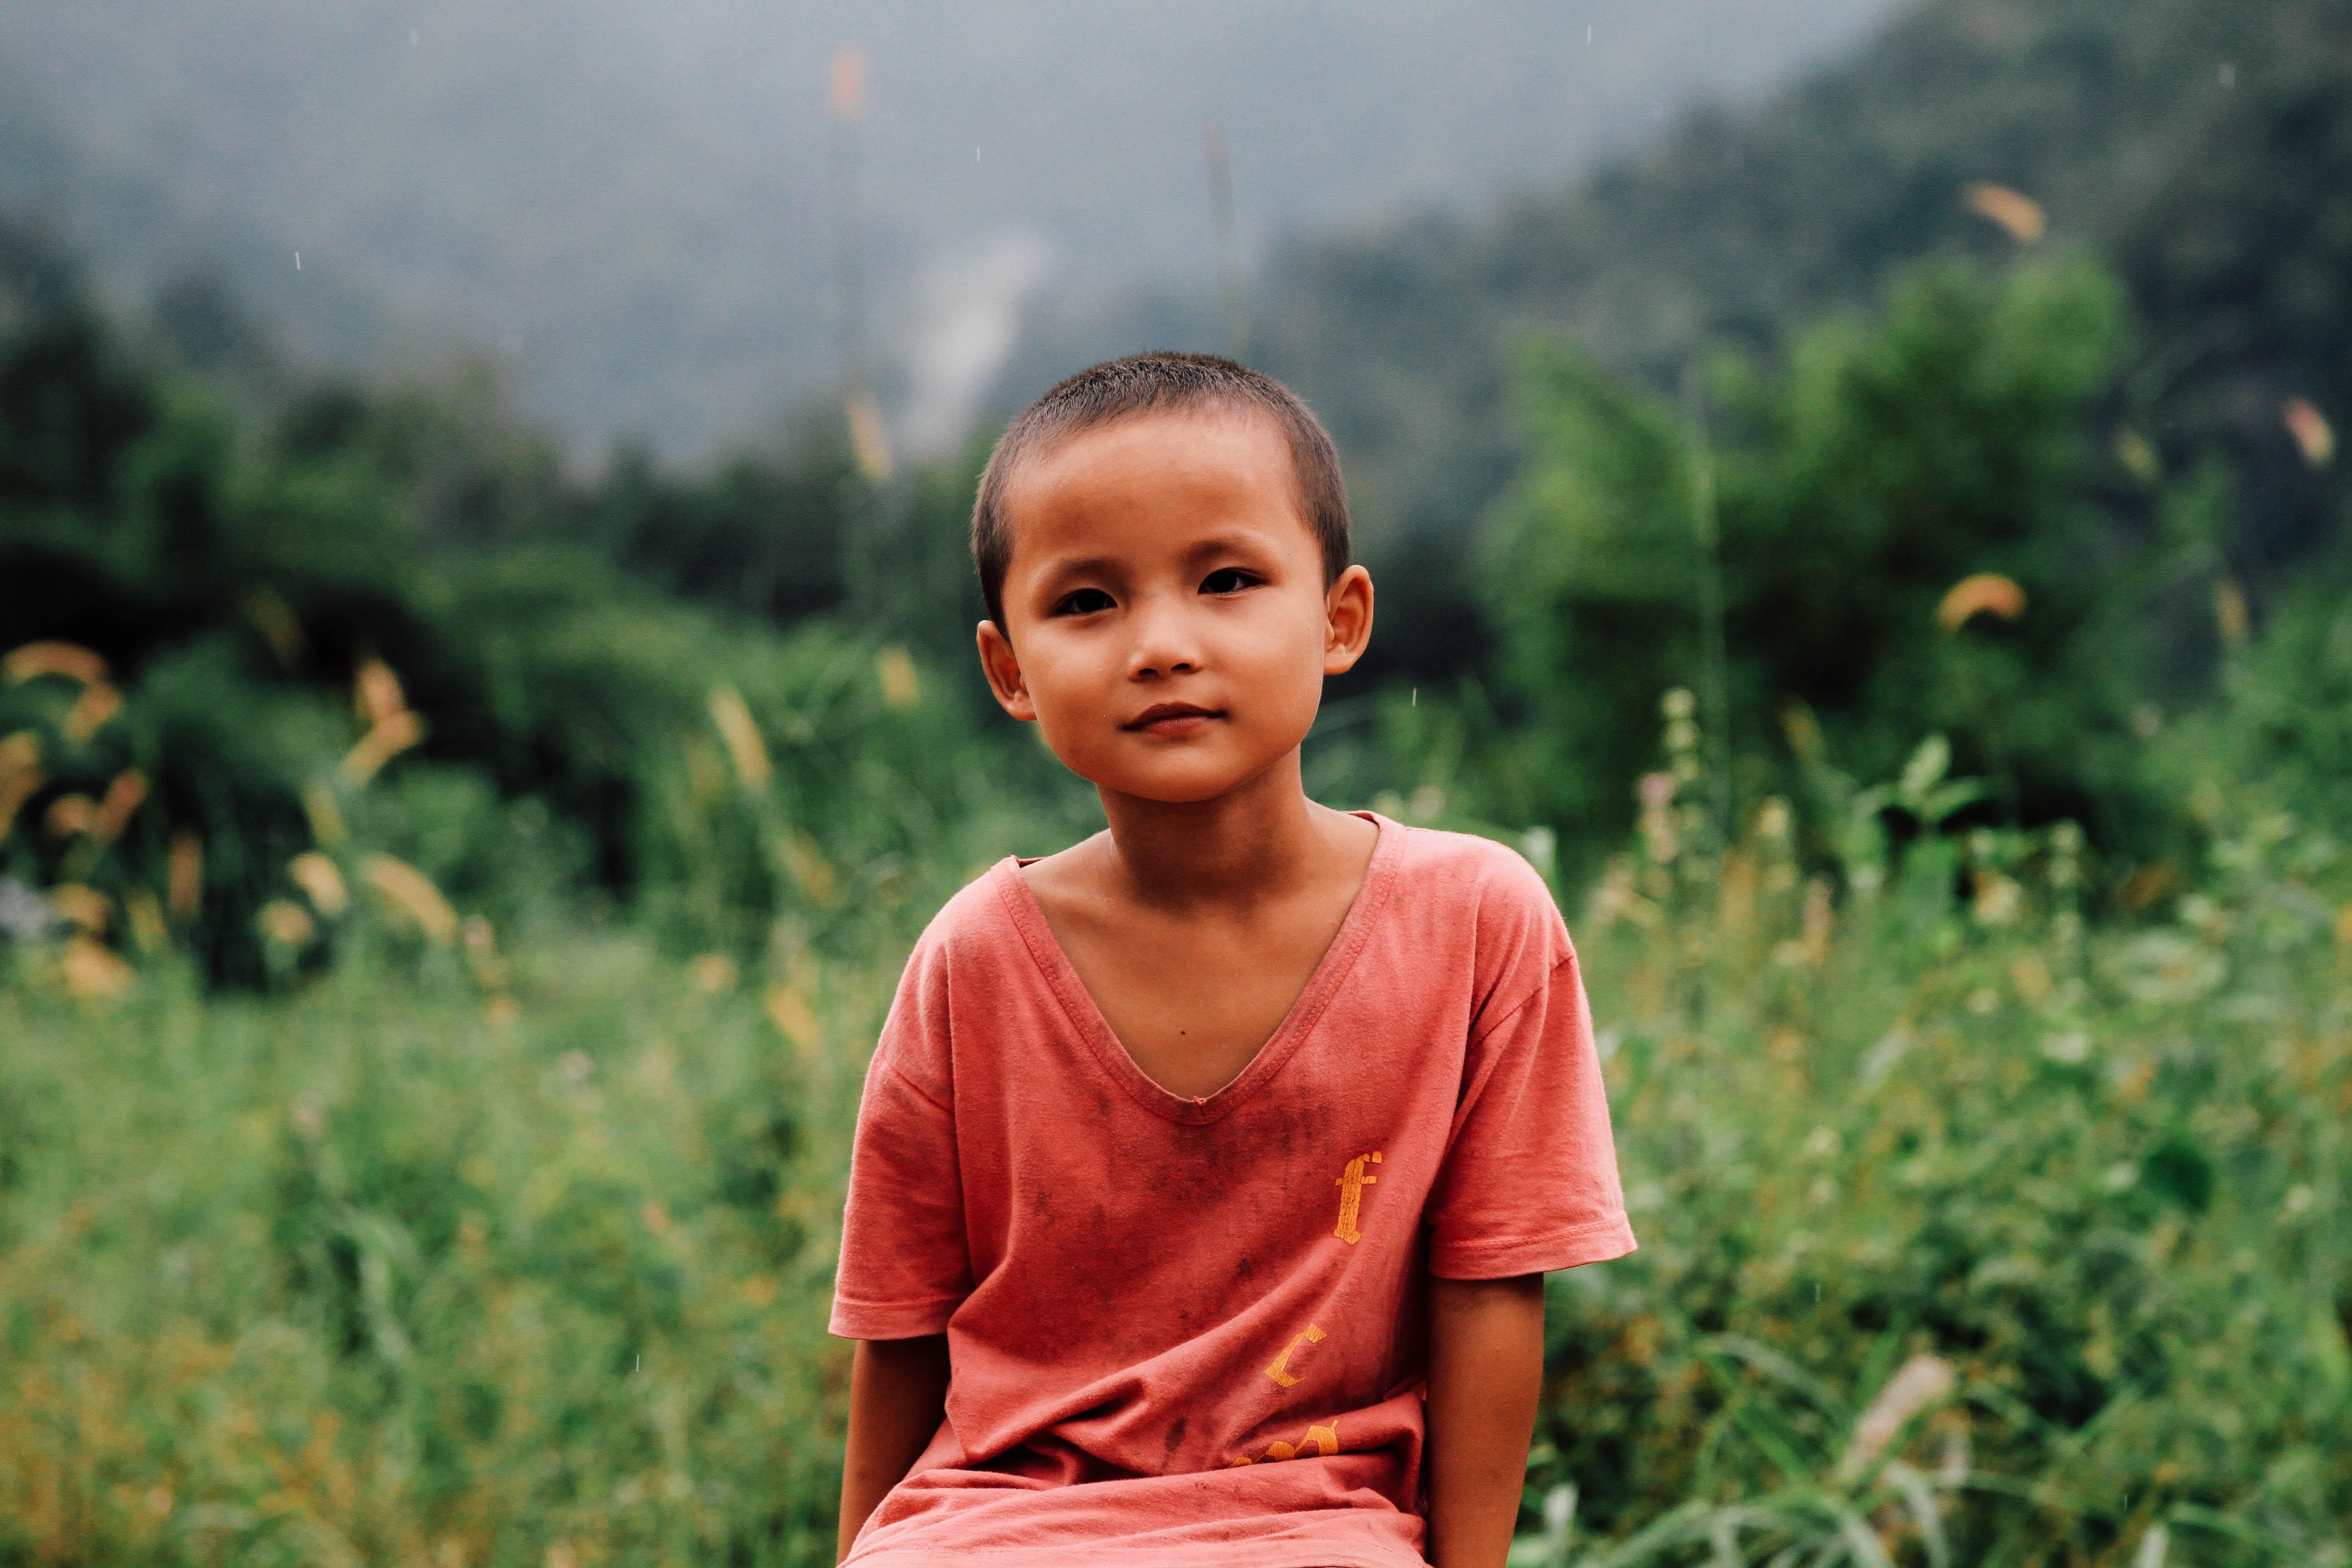 boy in red shirt sitting on grass